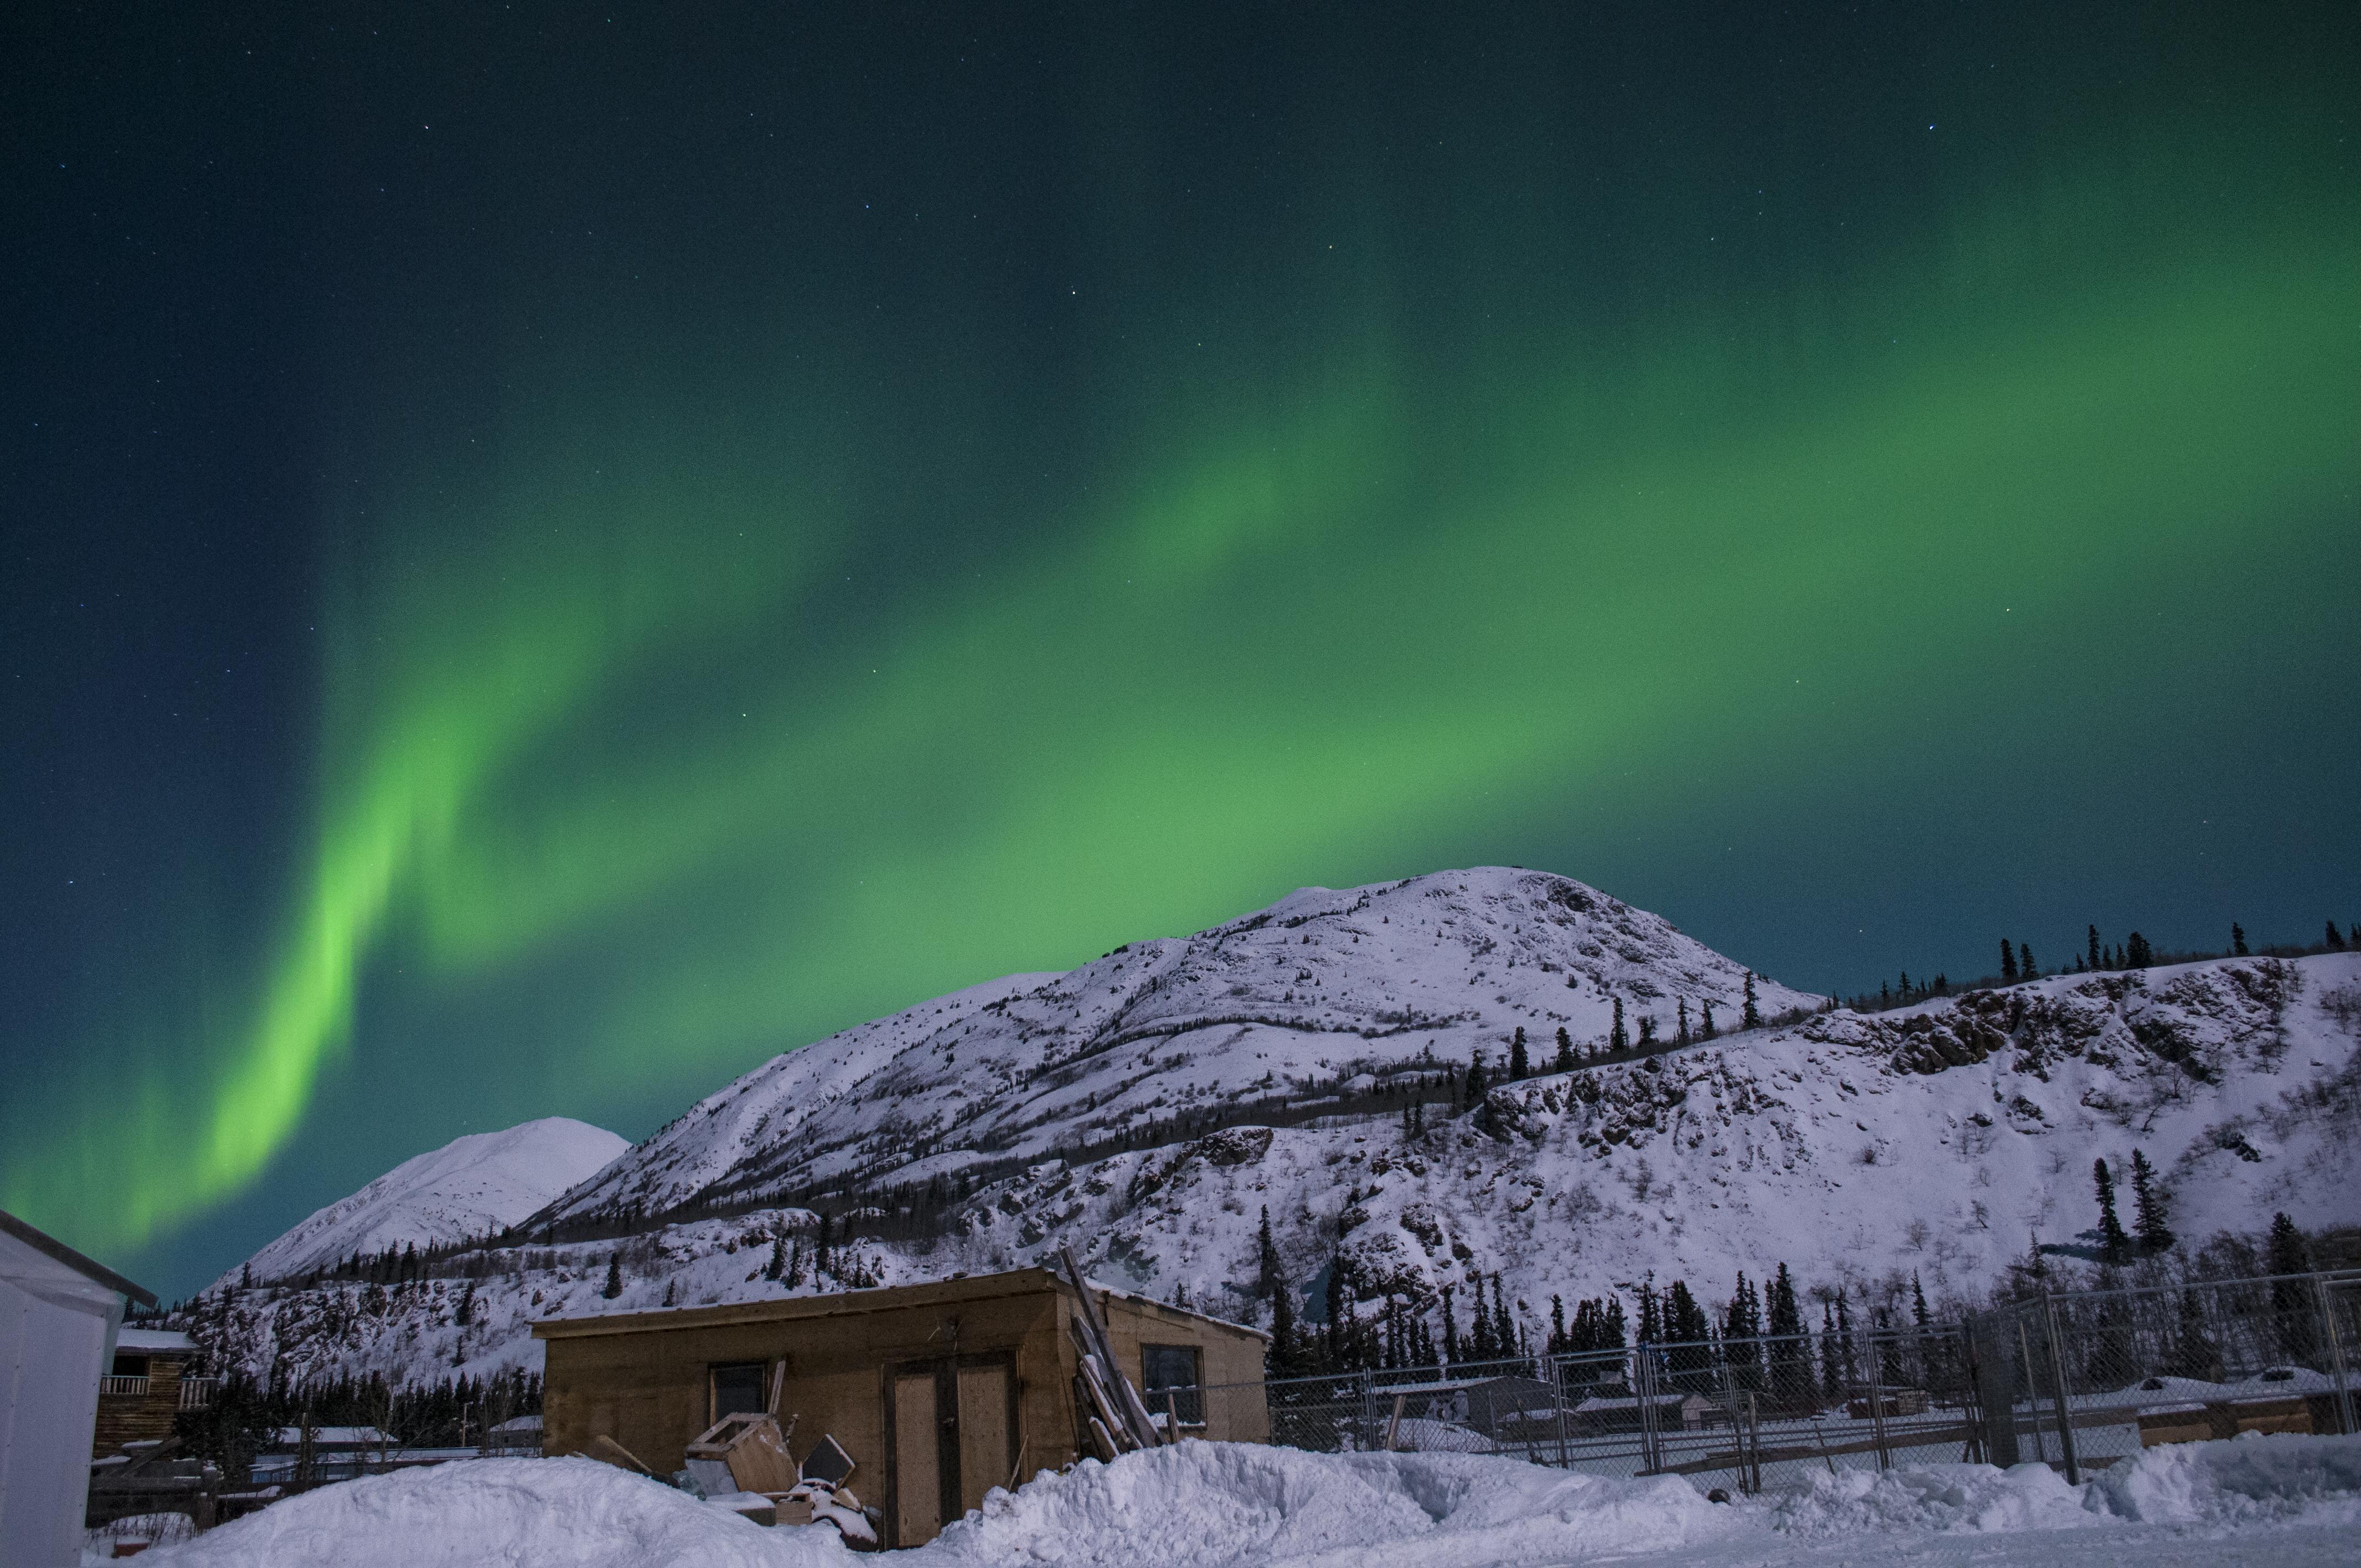 Aurora photography|Yukon|Borealkenn